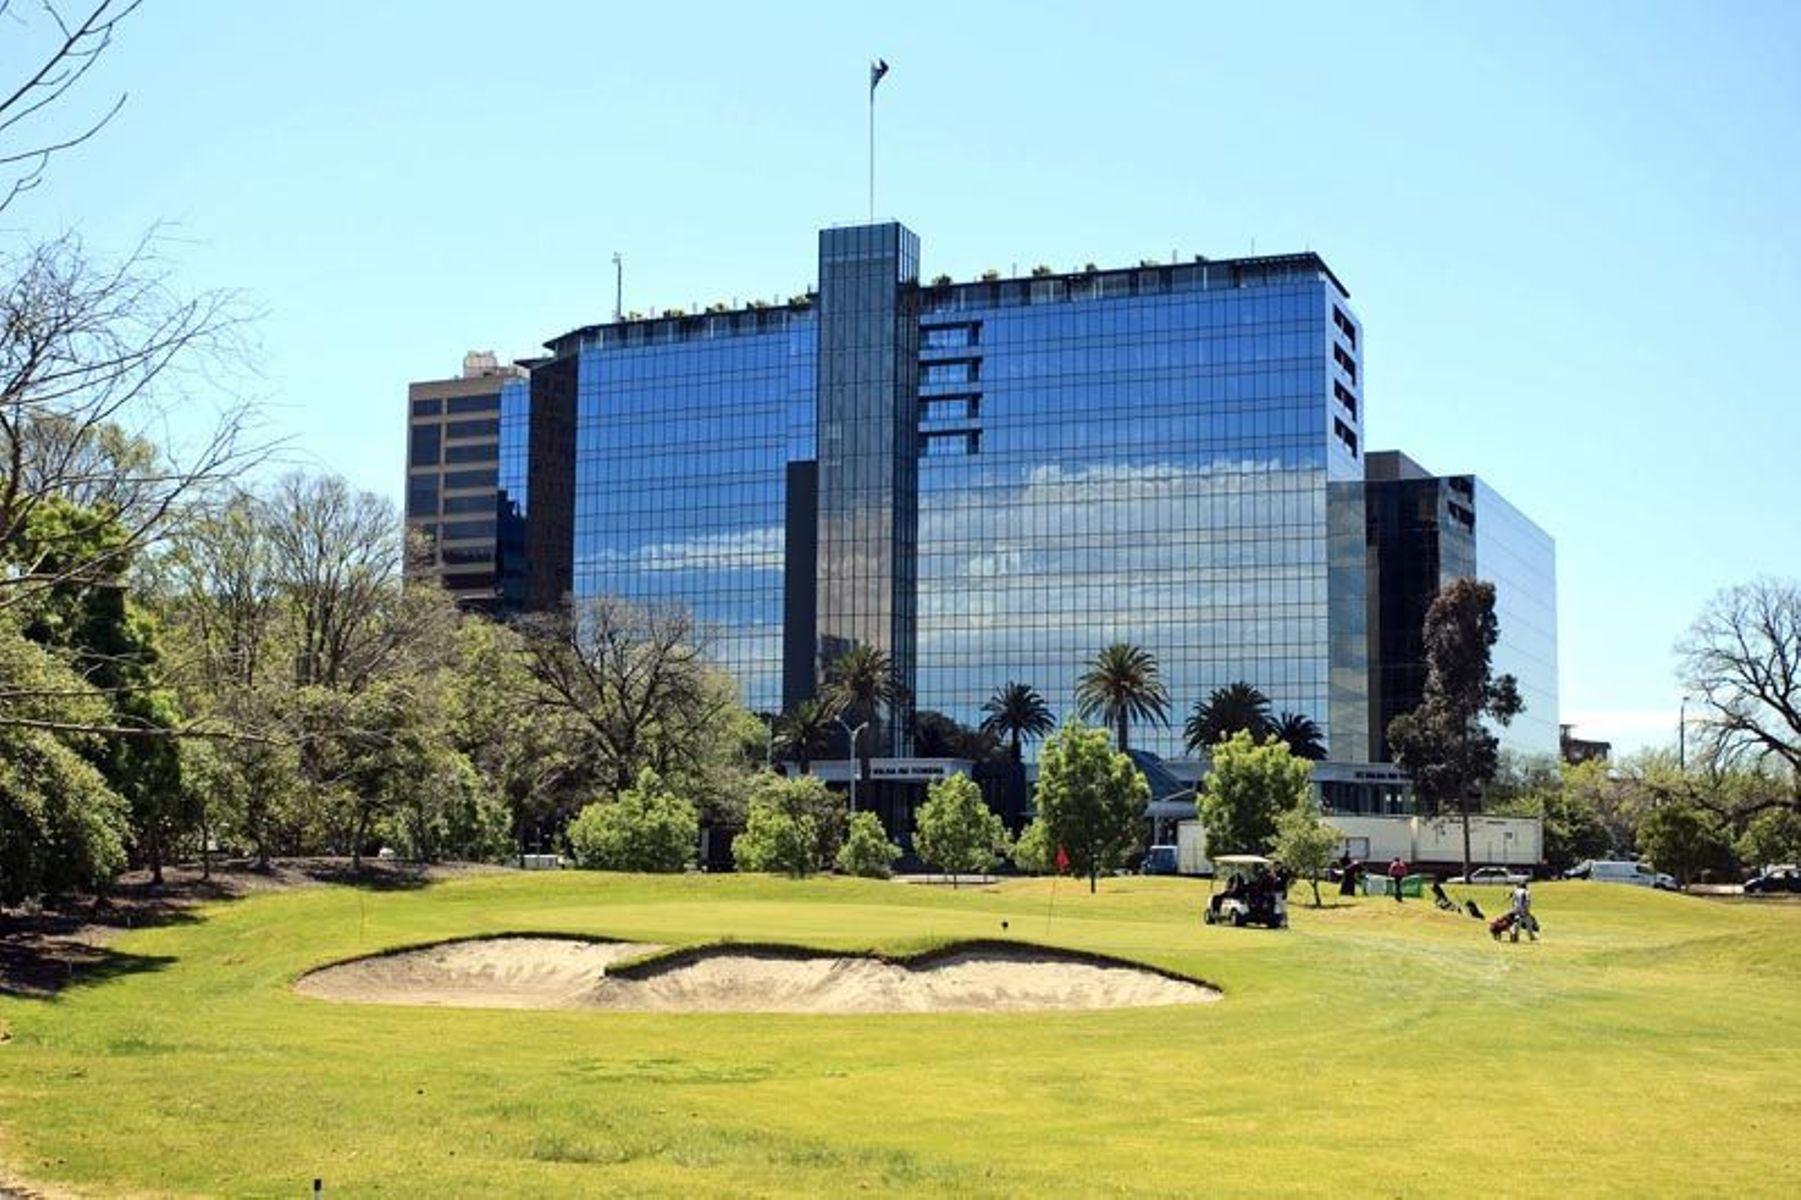 983 VCL3556 Queens Road Melbourne Melbourne City Melbourne Victoria Australia